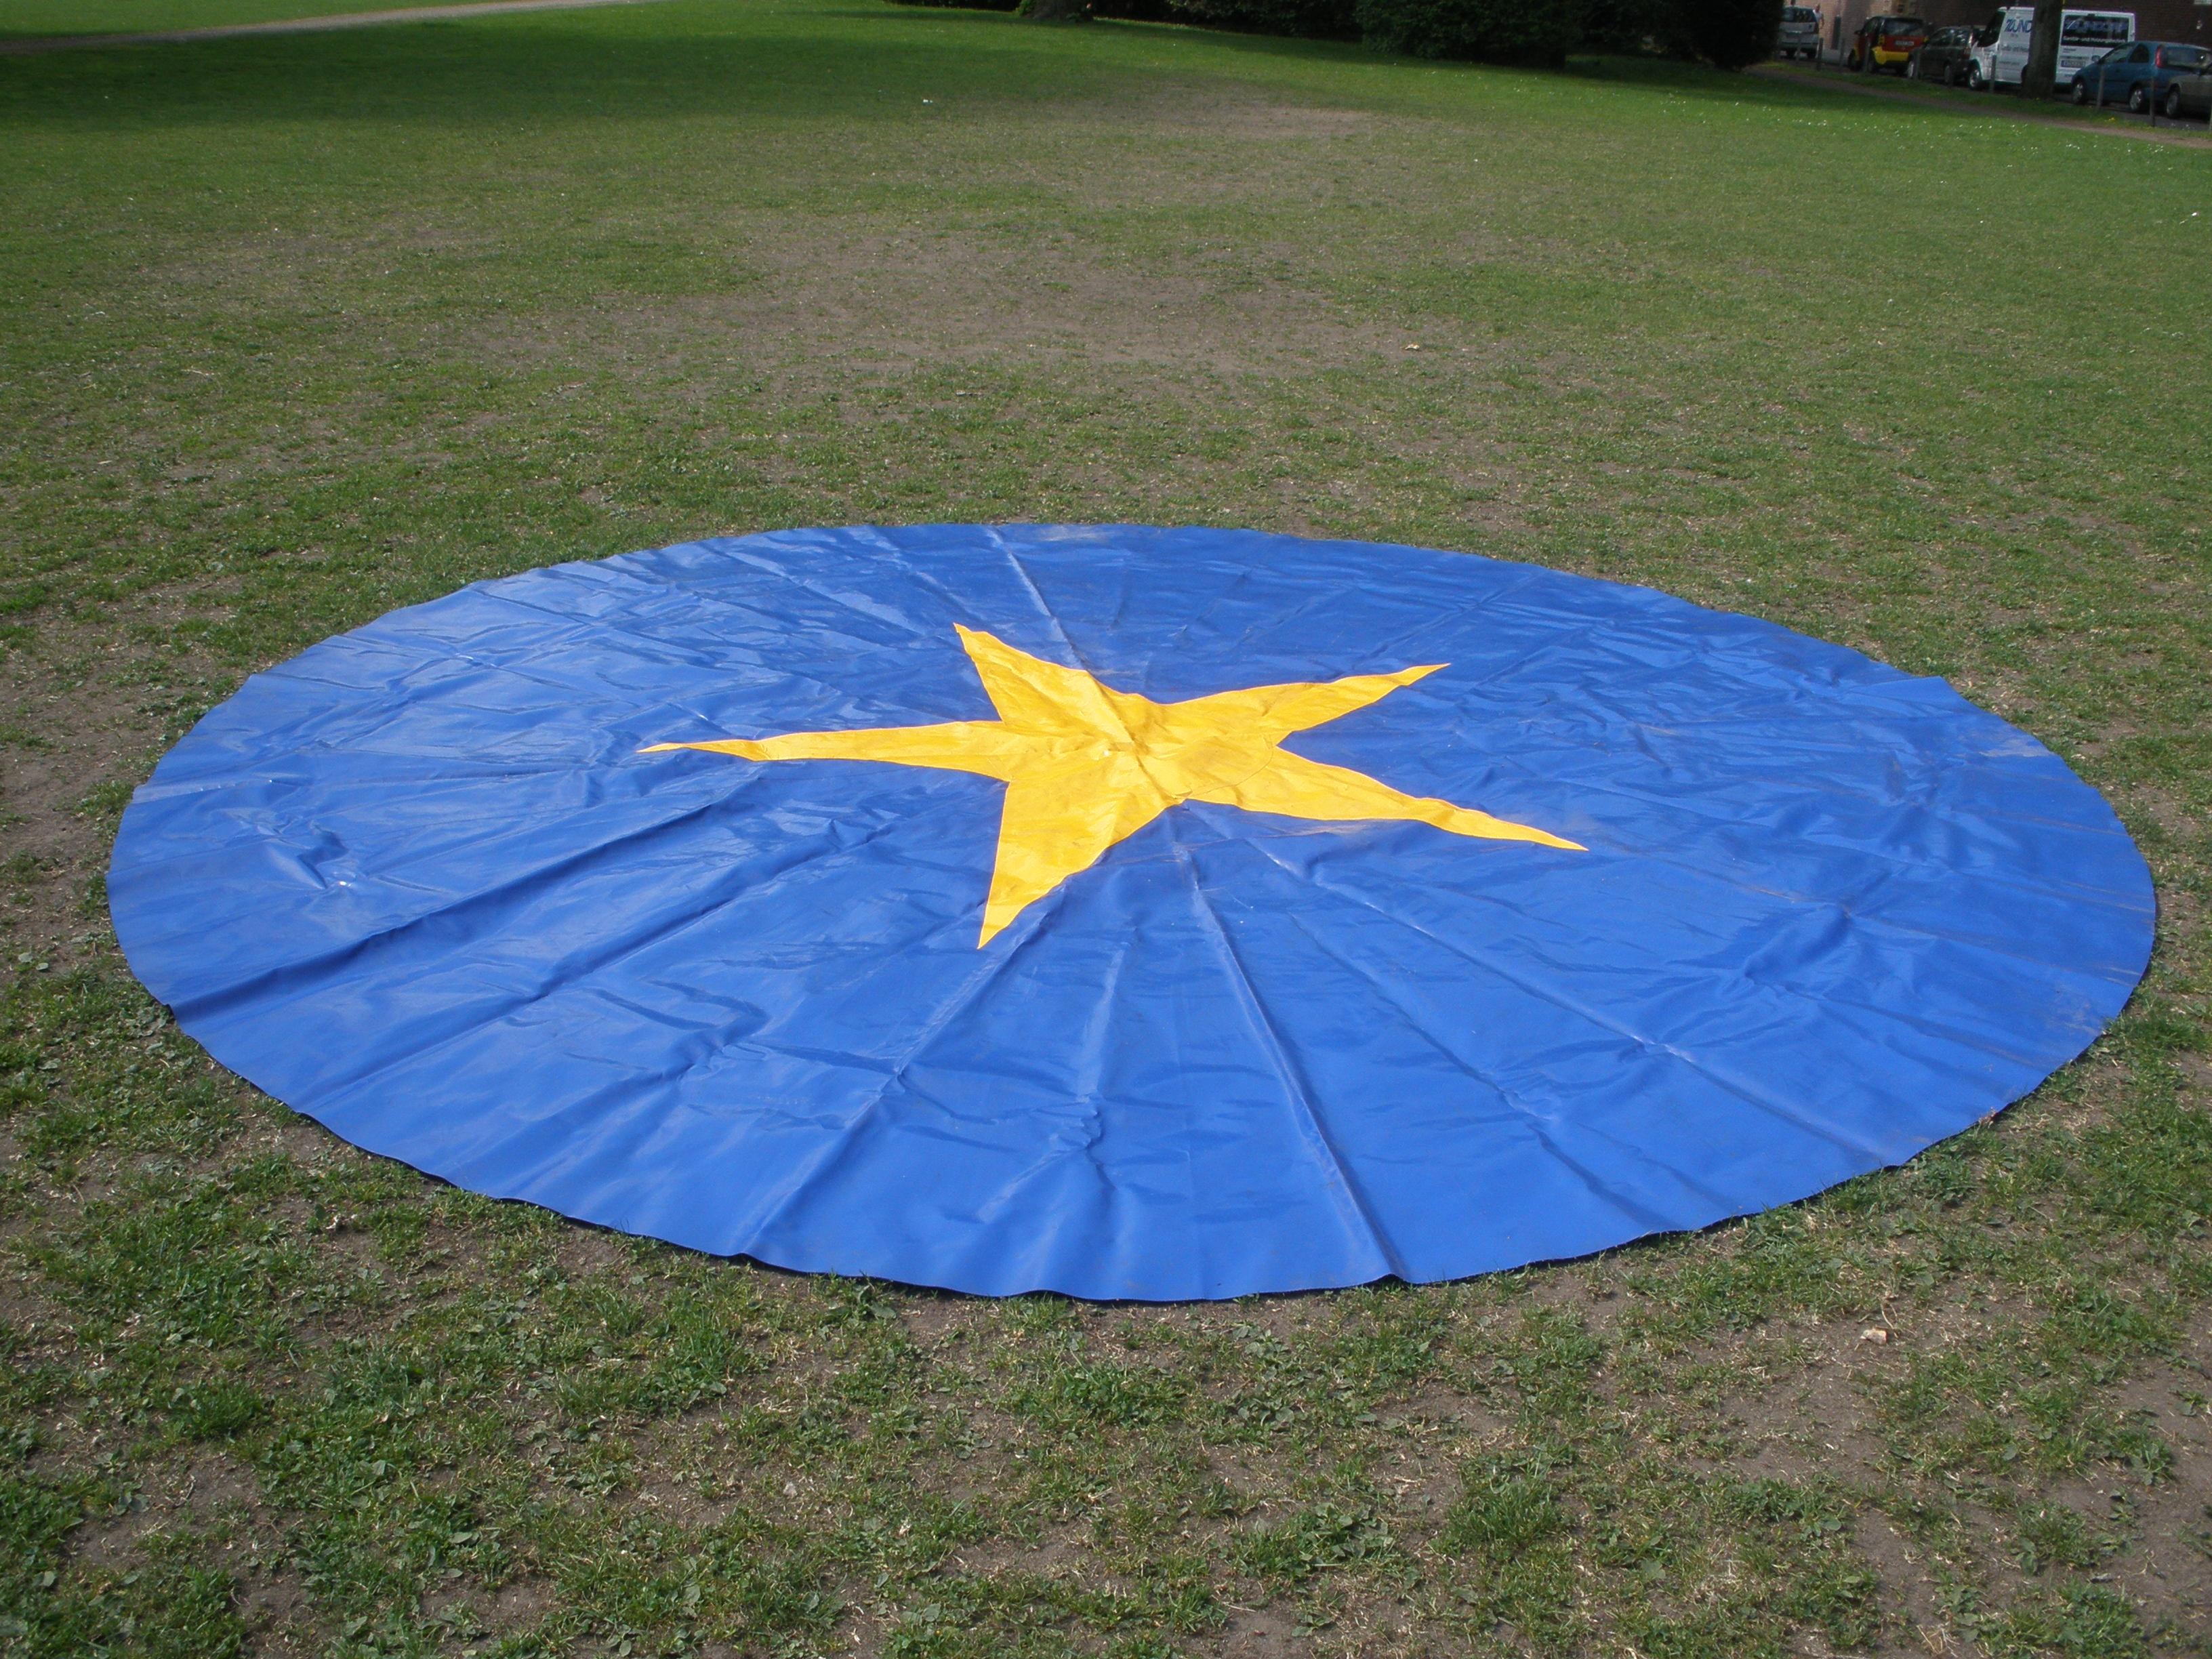 circus carpet 4,5m circusevents koeln 2